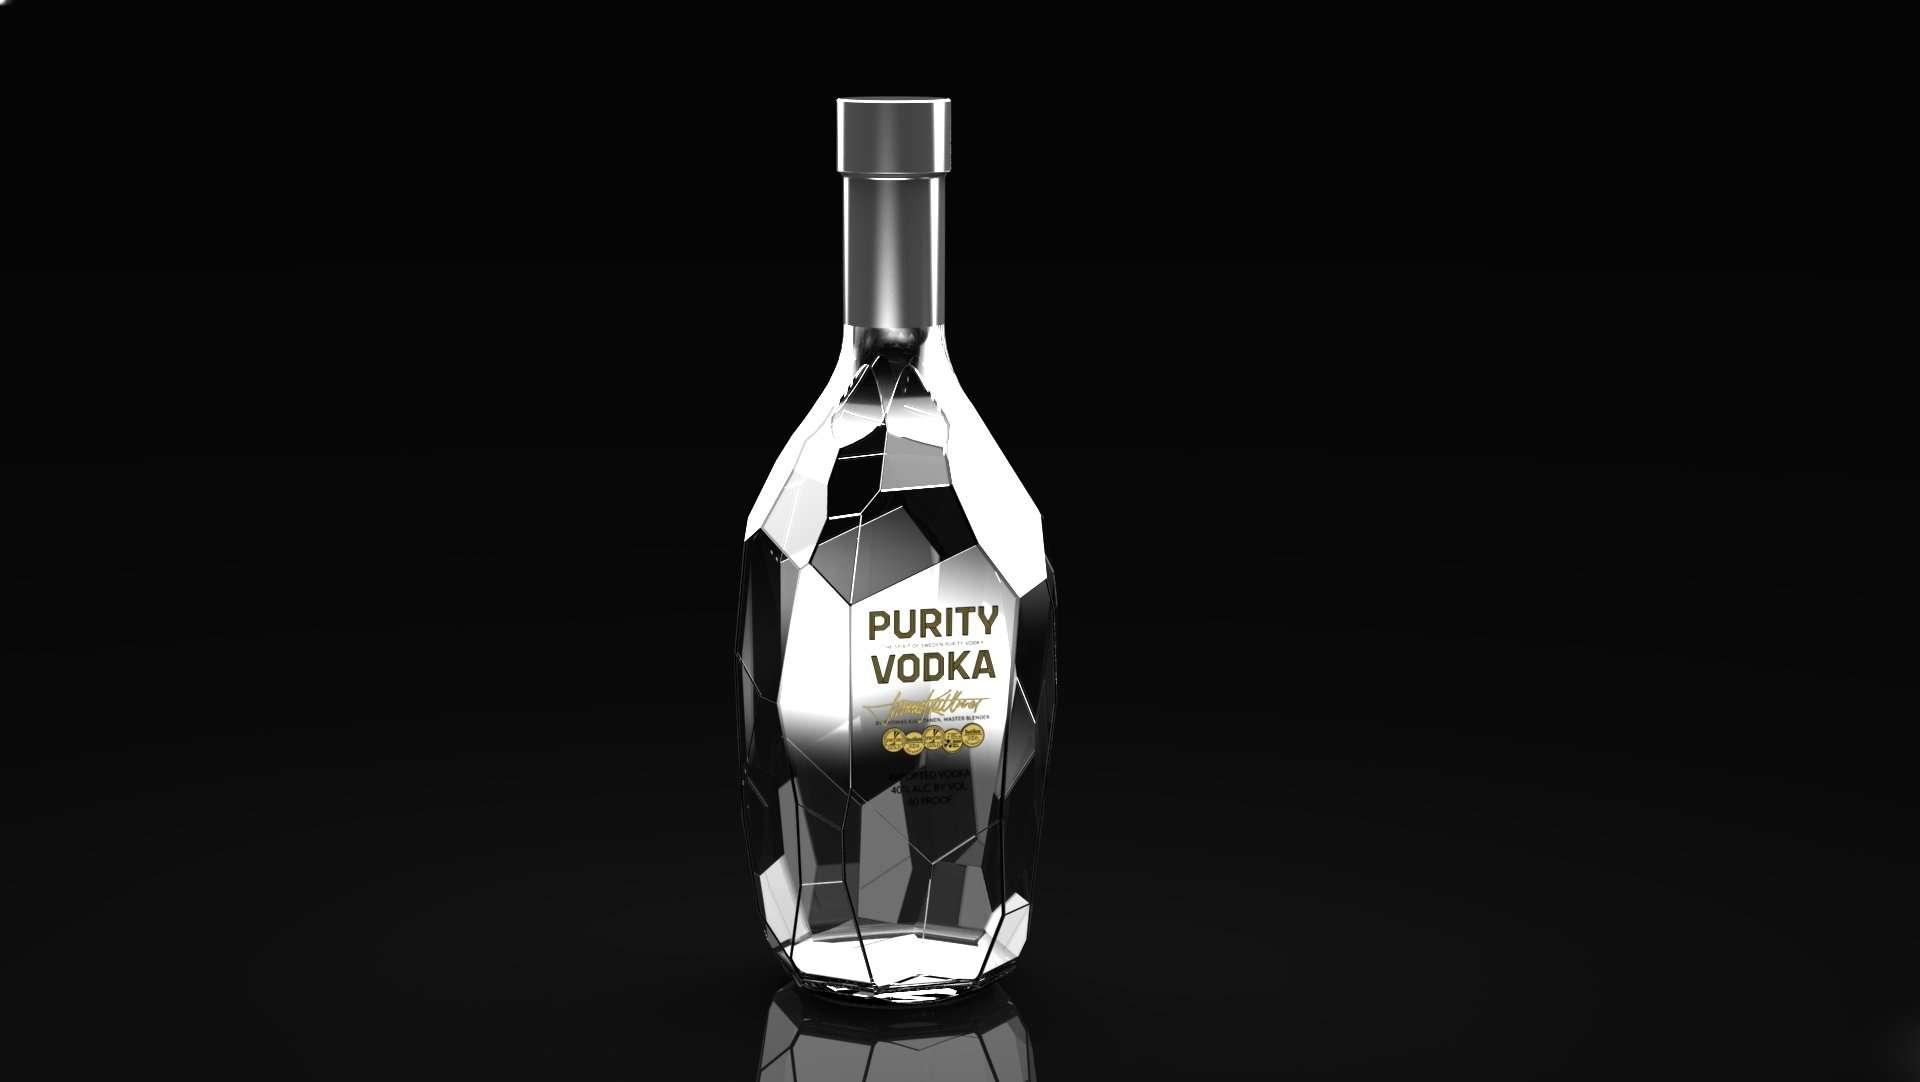 Purity – vodka